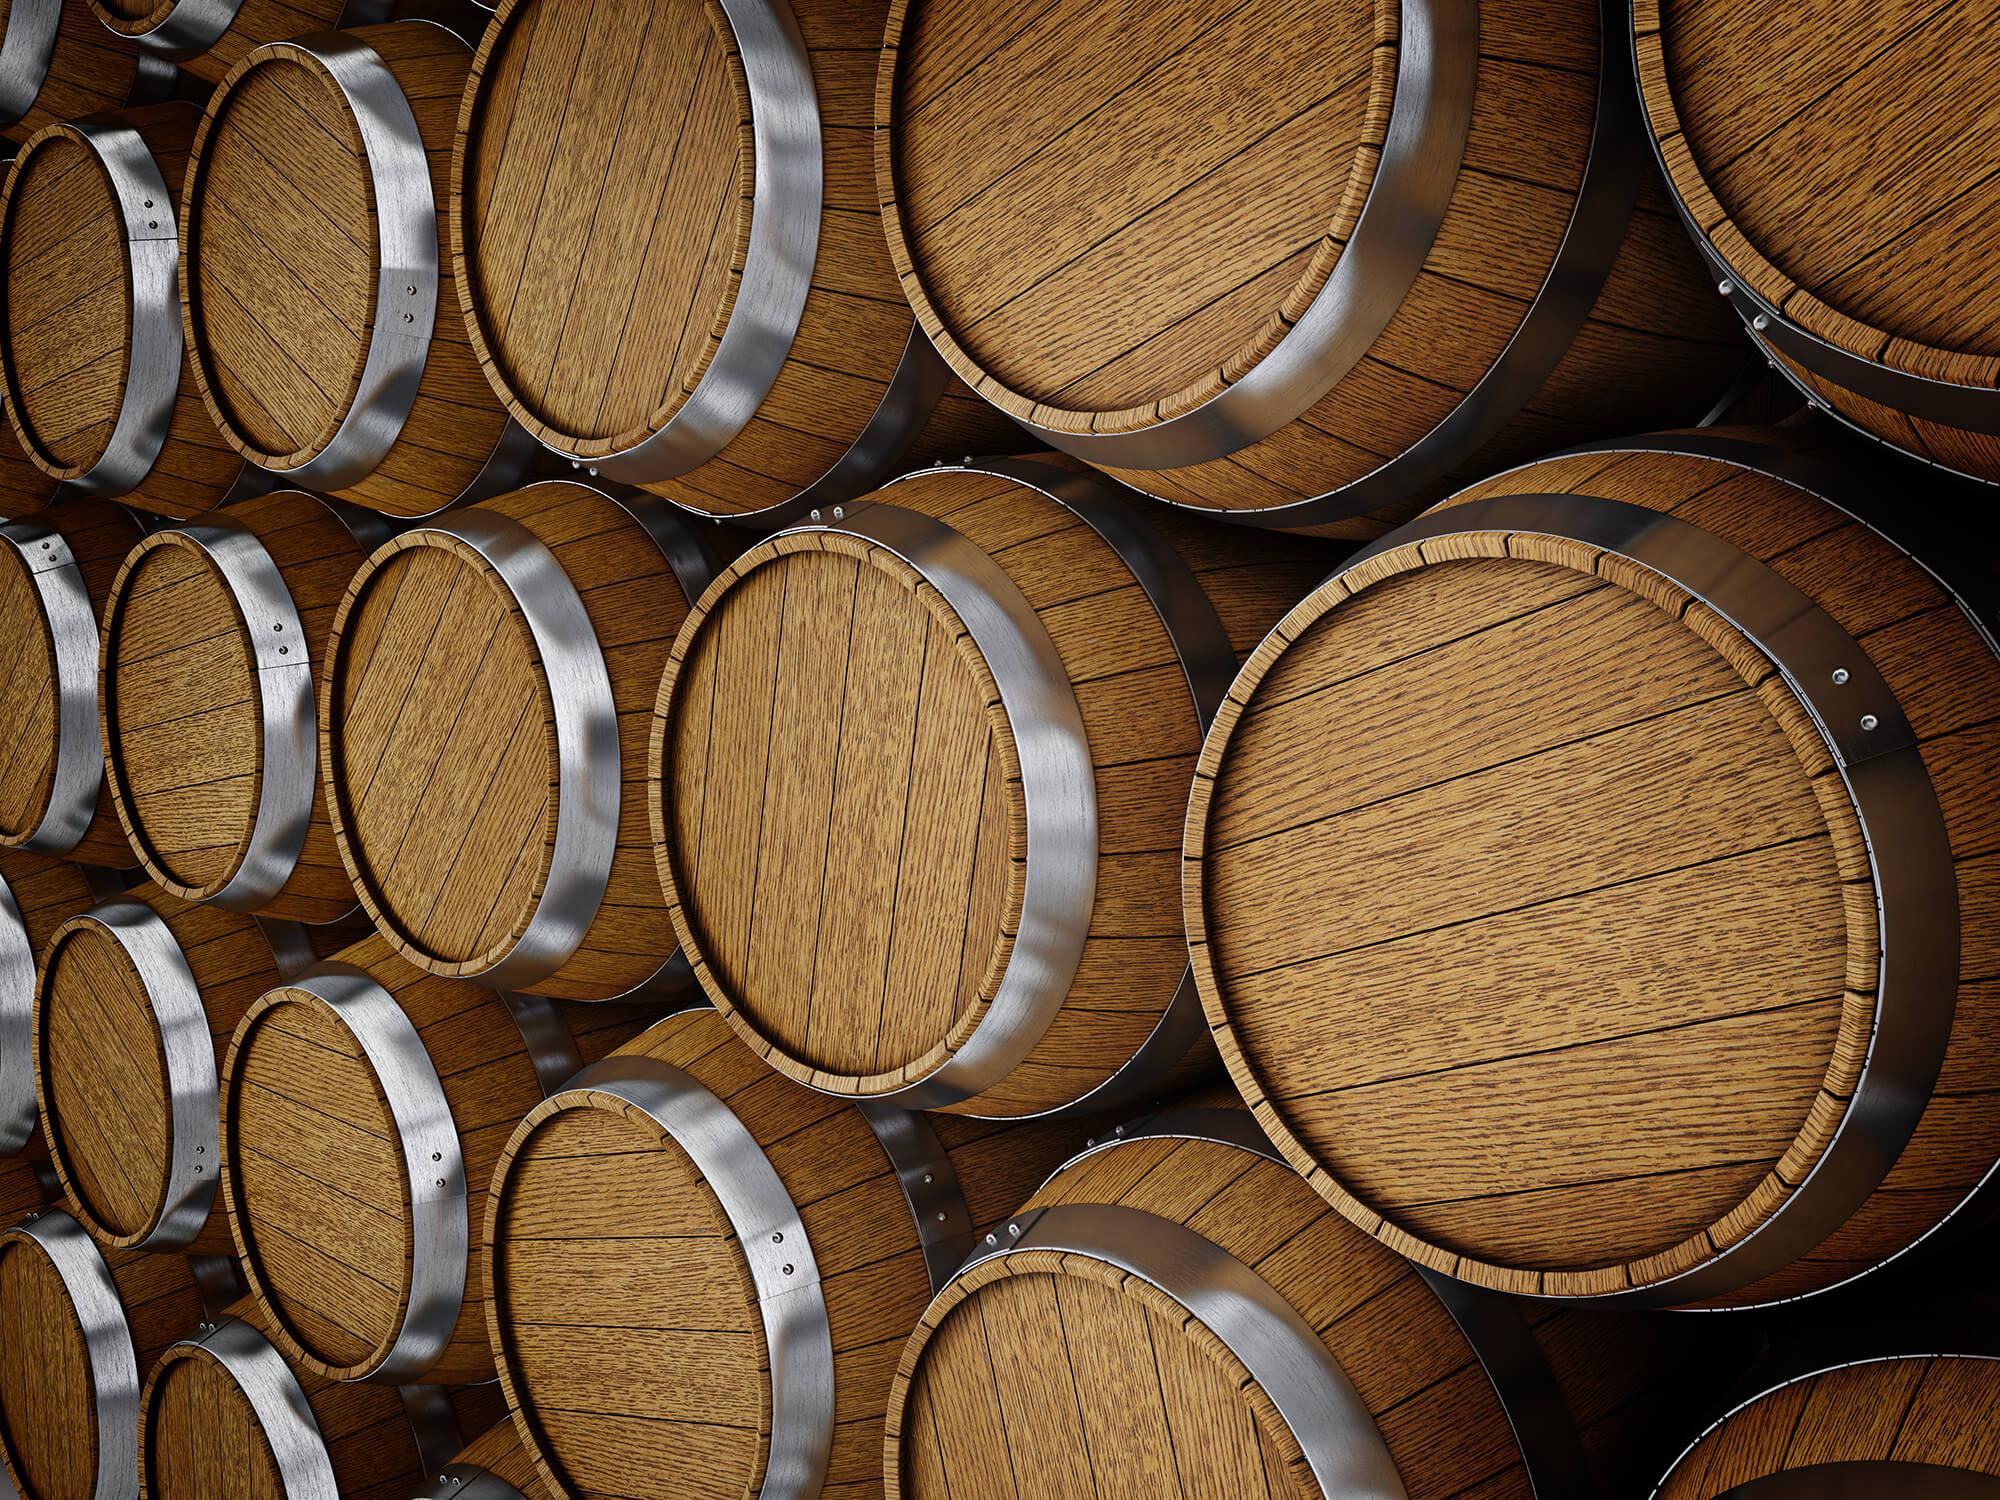 About Distillers' Art